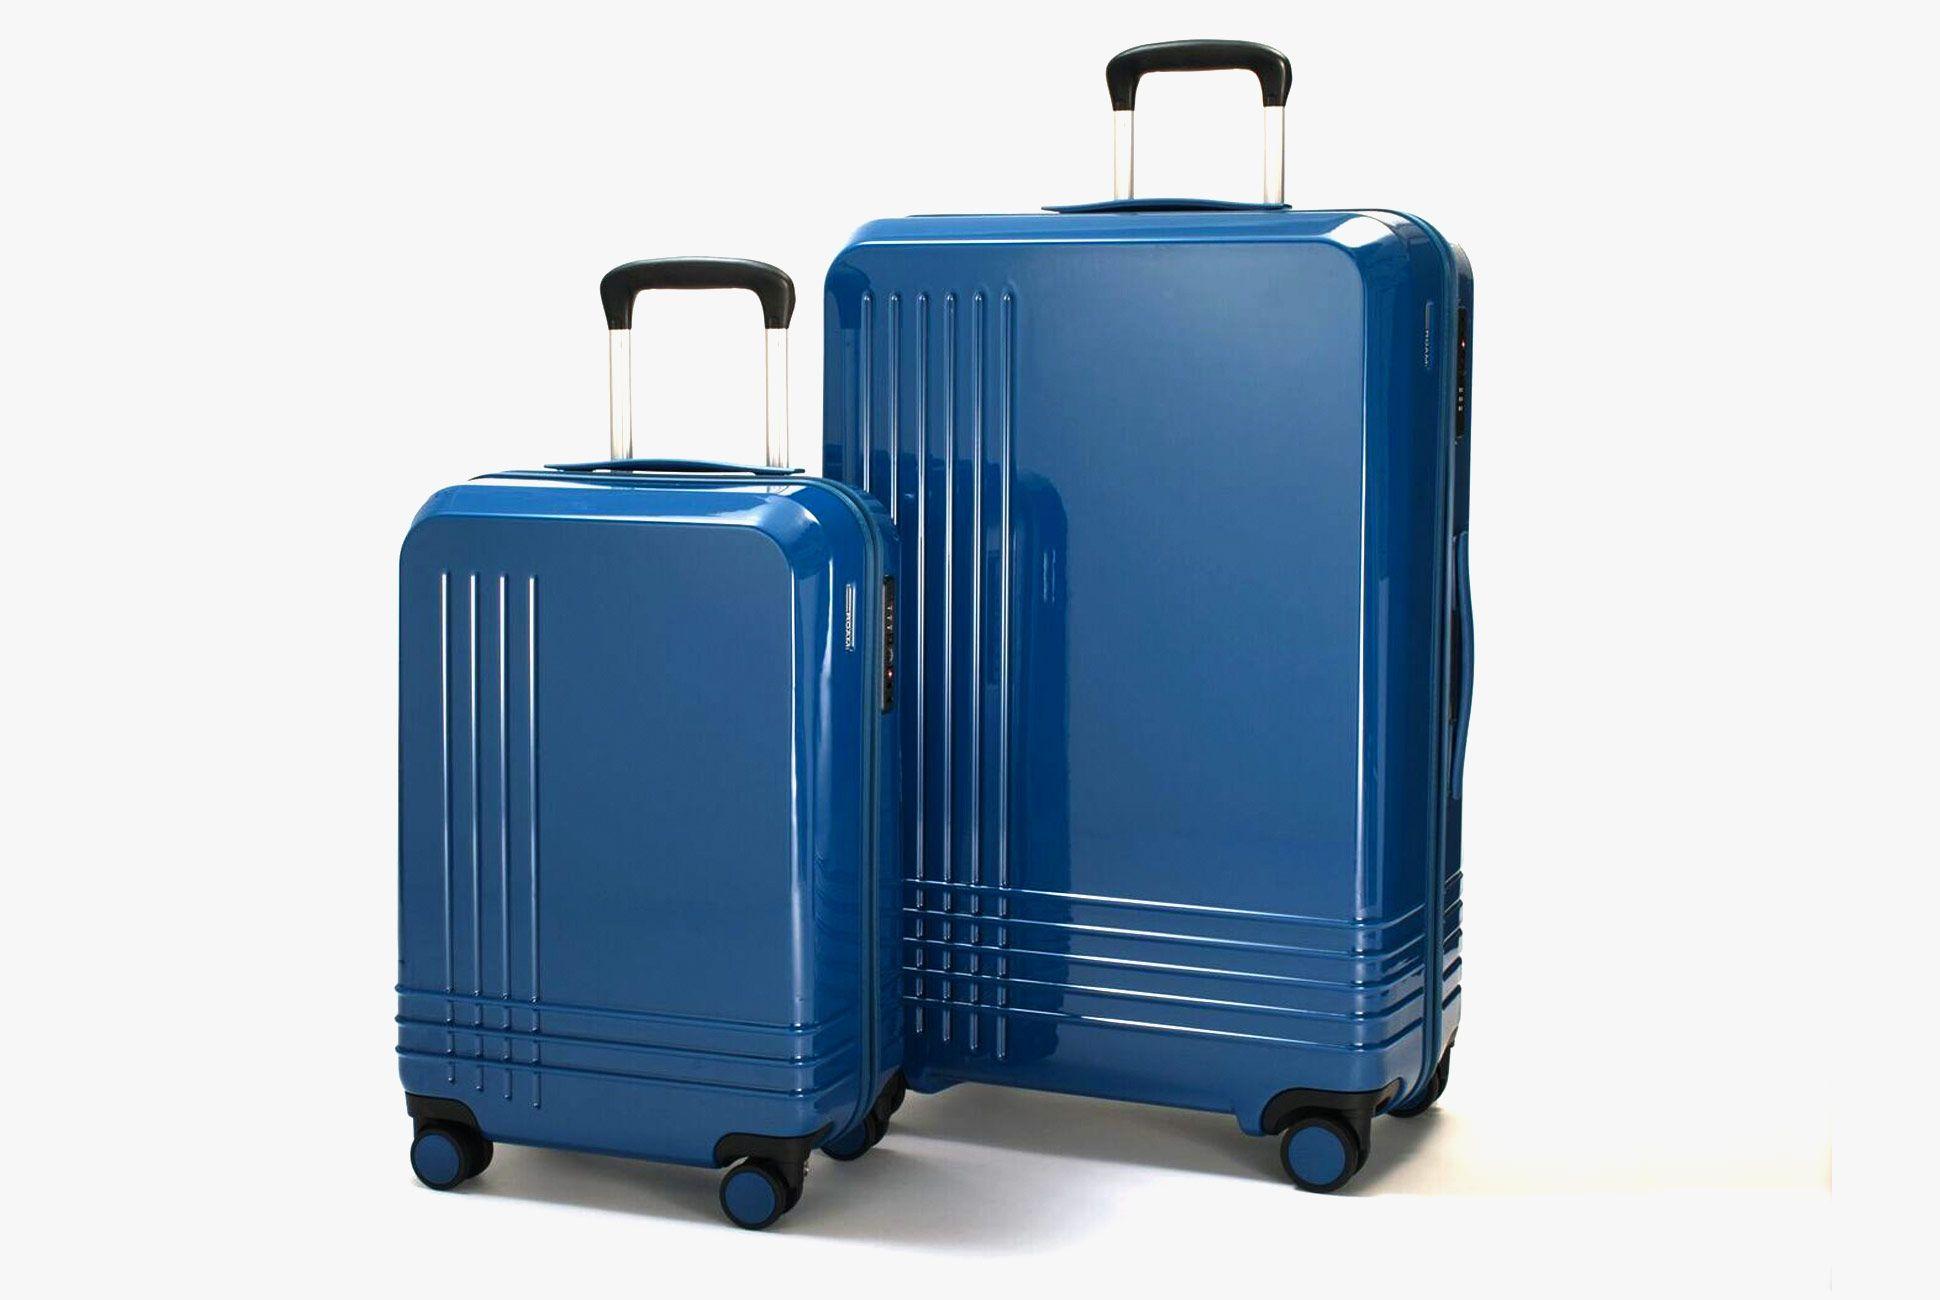 Roam-Suitcases-gear-patrol-4